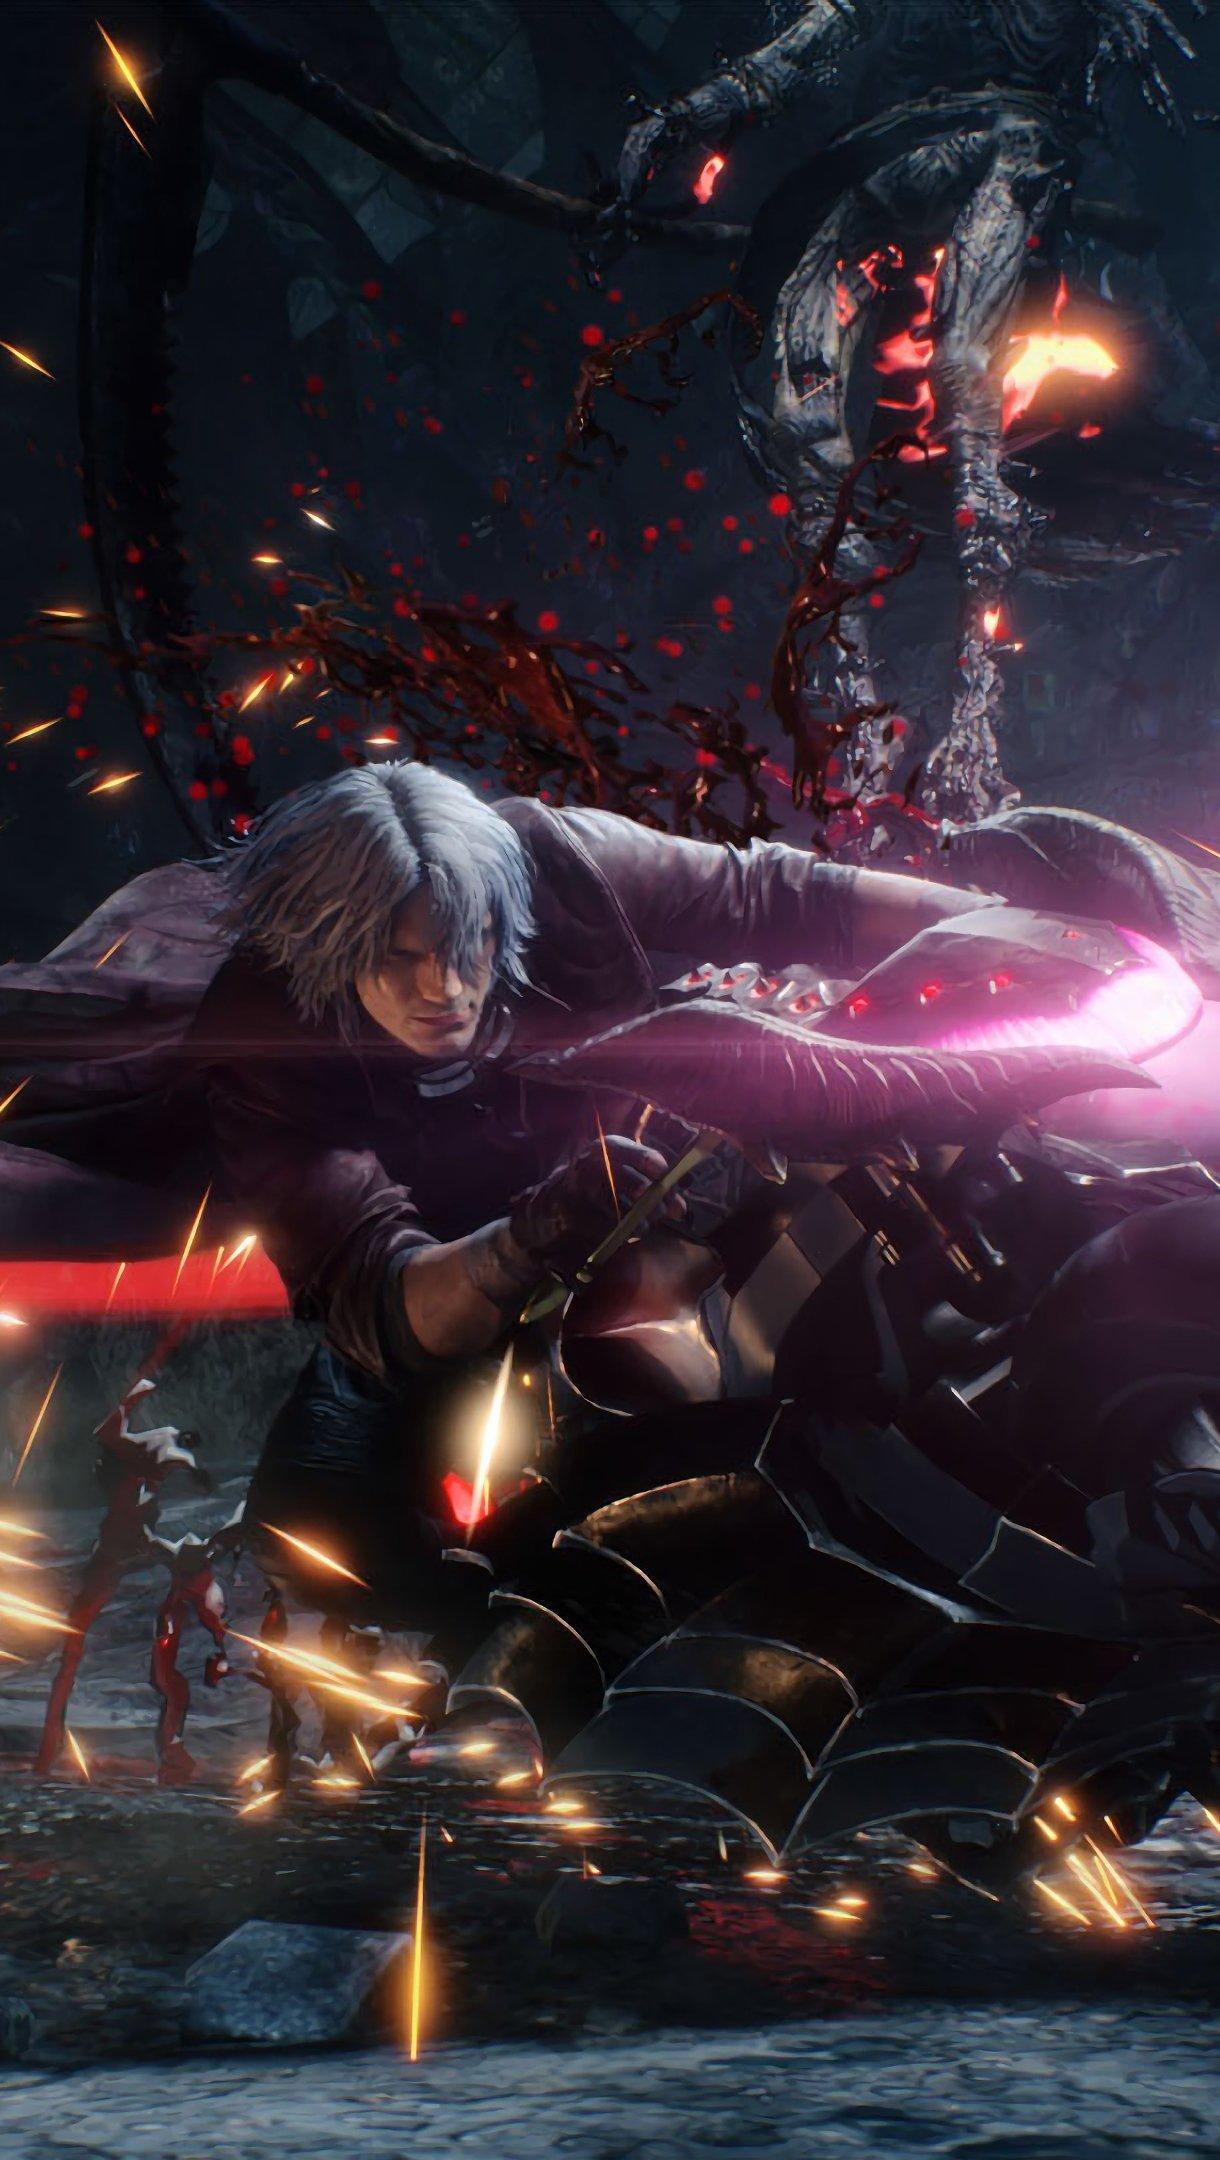 Fondos de pantalla Dante en motocicleta de Devil May Cry 5 Vertical